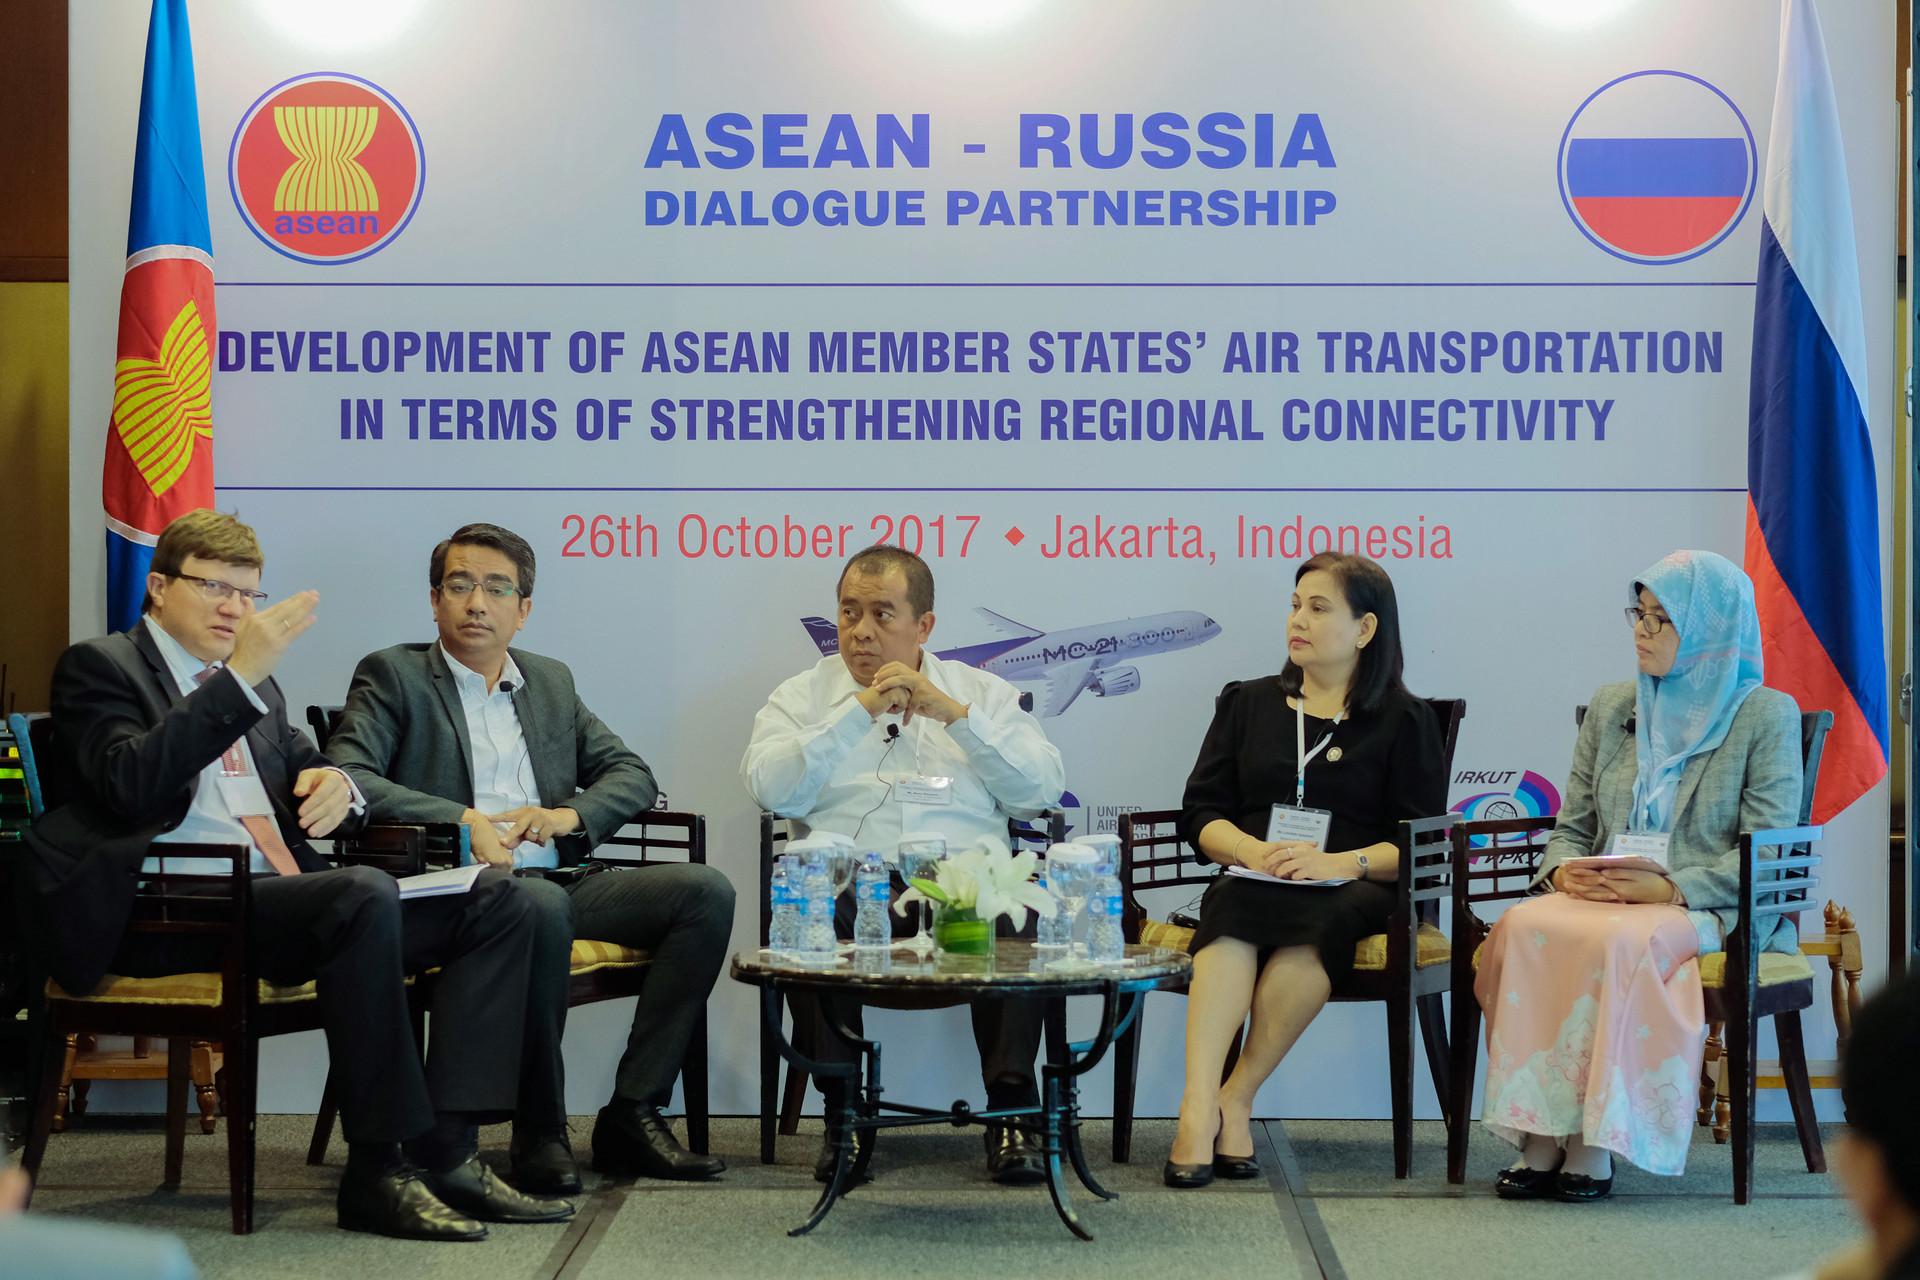 Sesi diskusi selama dialog kemitraan ASEAN-Rusia di Hotel Gran Melia, Jakarta.